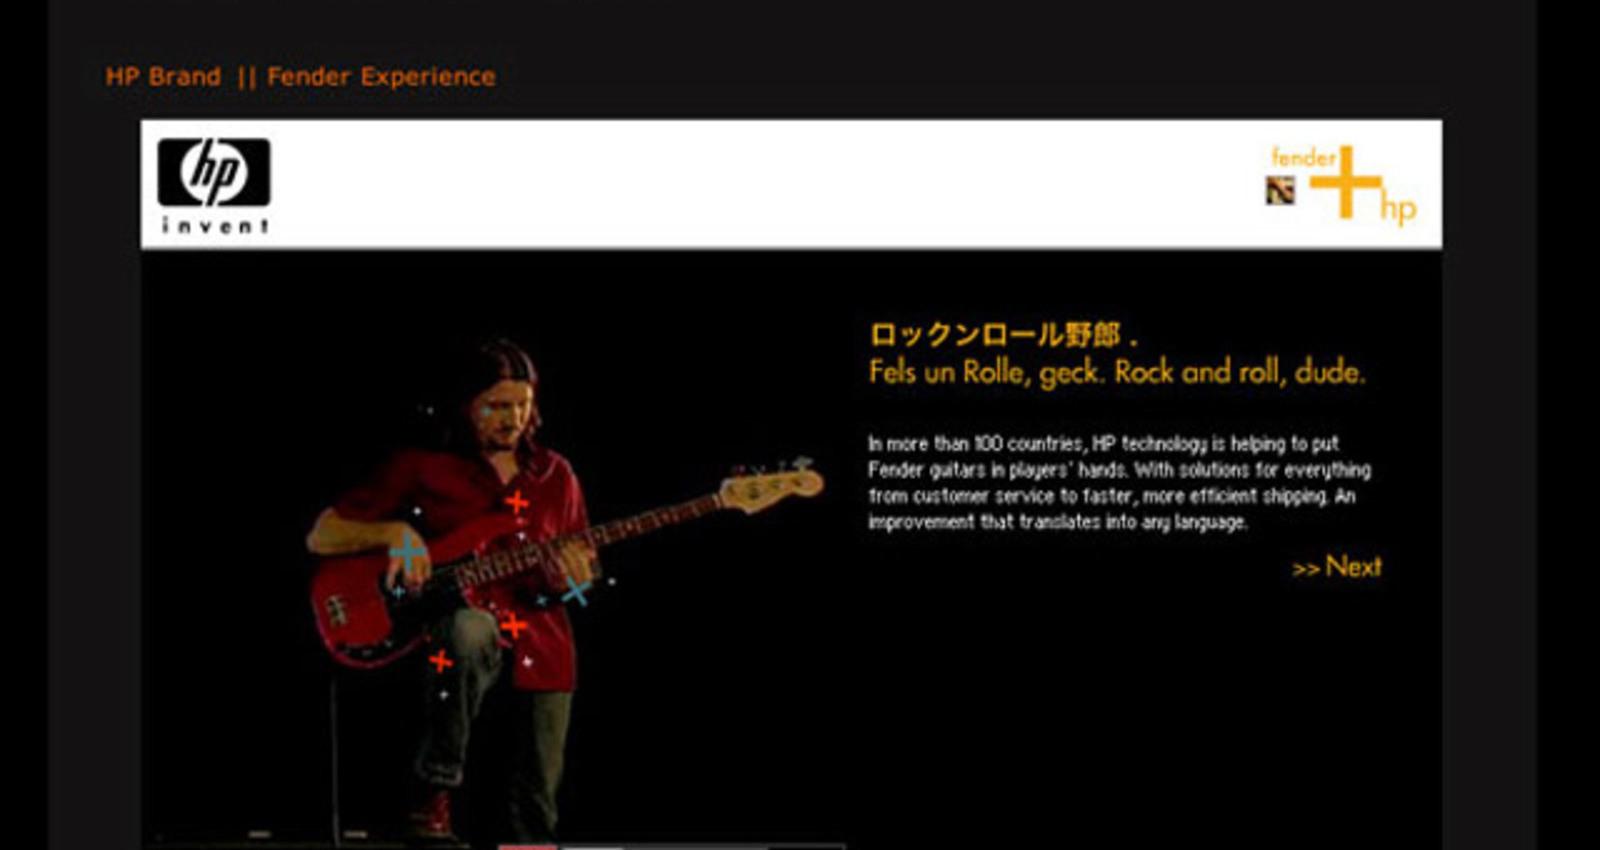 HP Fender Experience